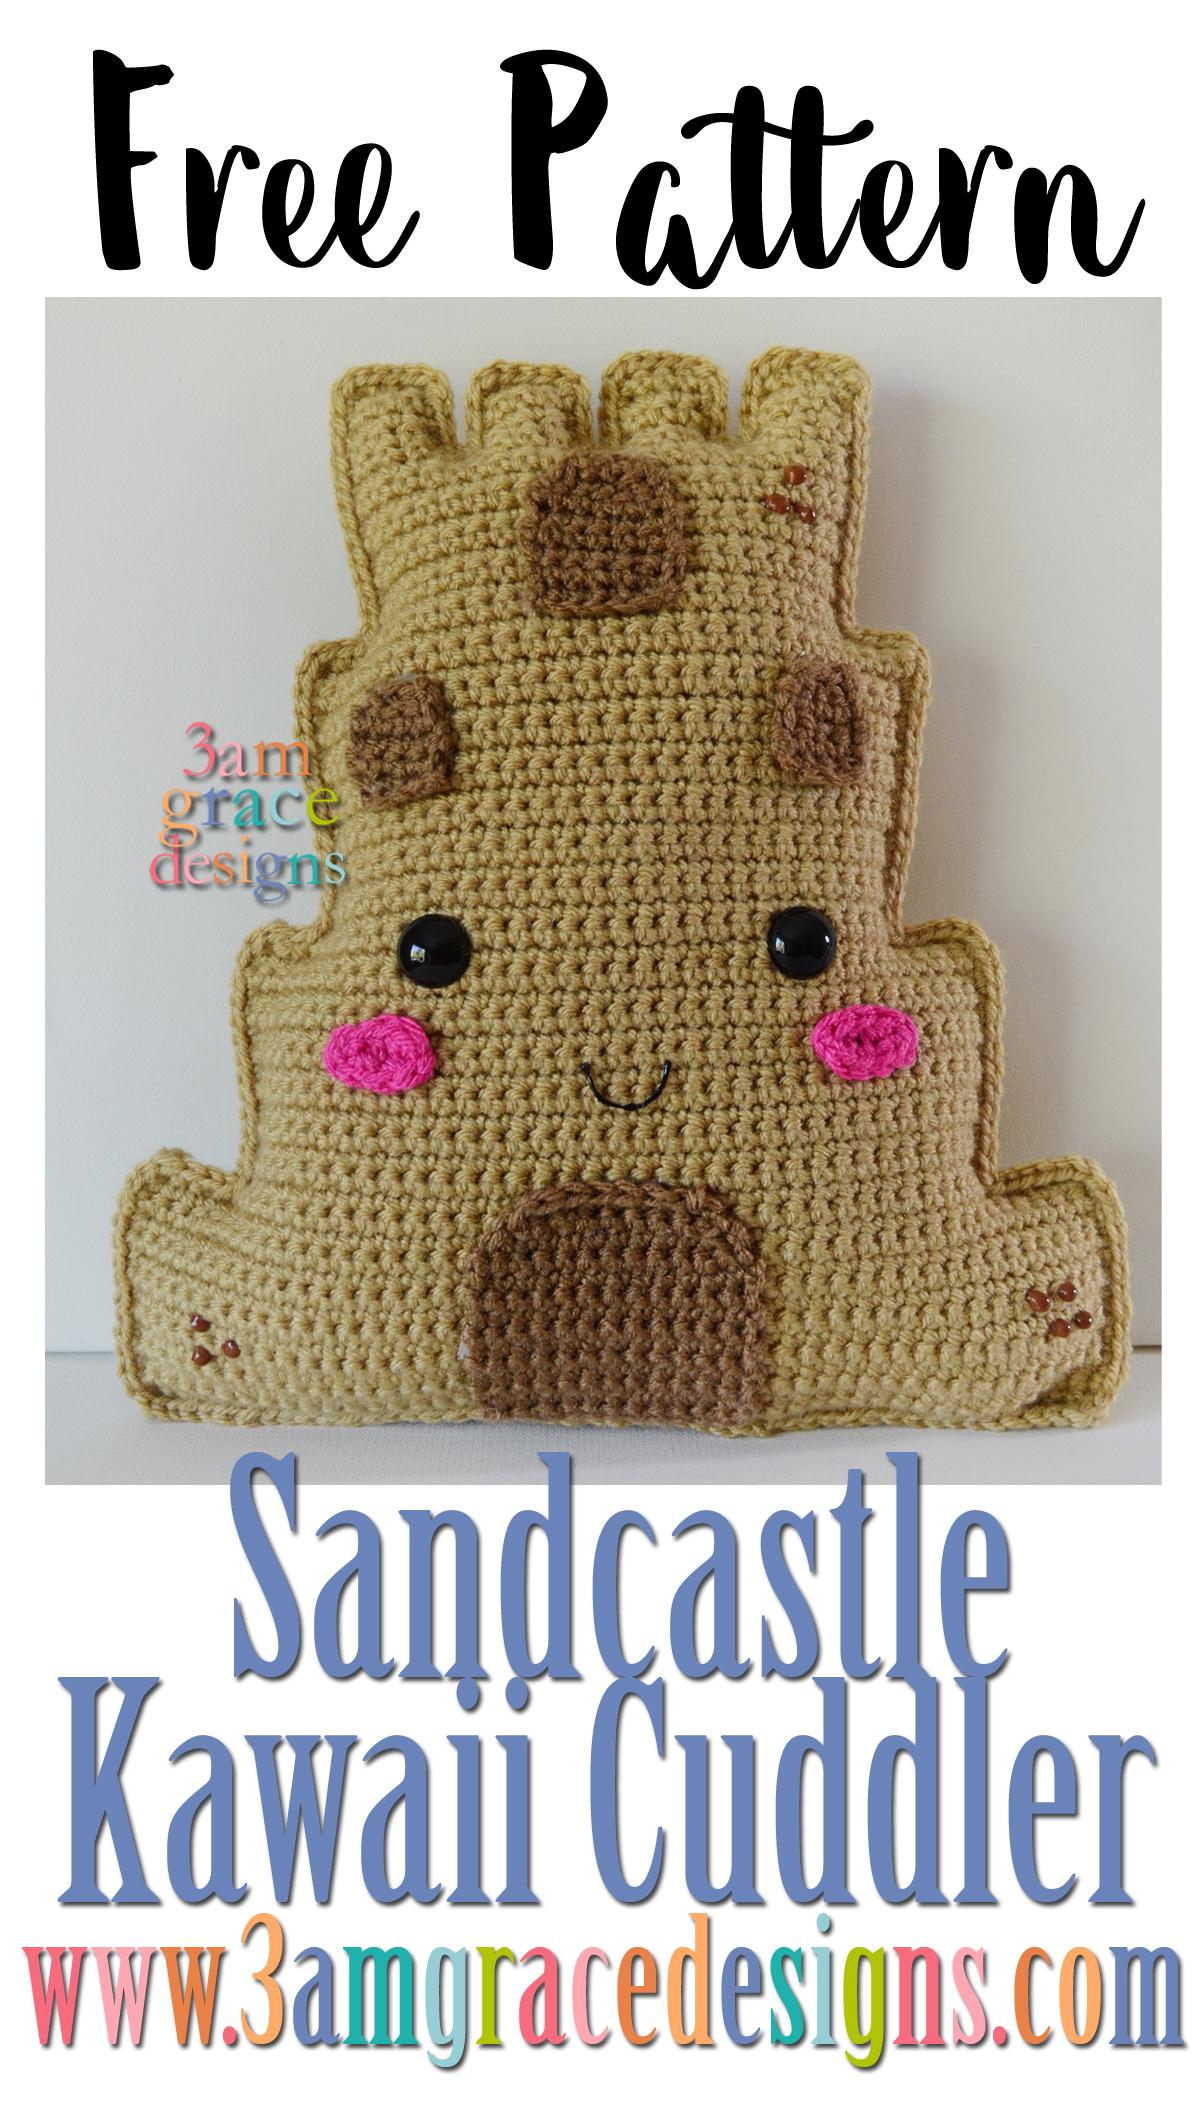 Sandcastle Kawaii Cuddler™ - Free Crochet Pattern | 3amgracedesigns